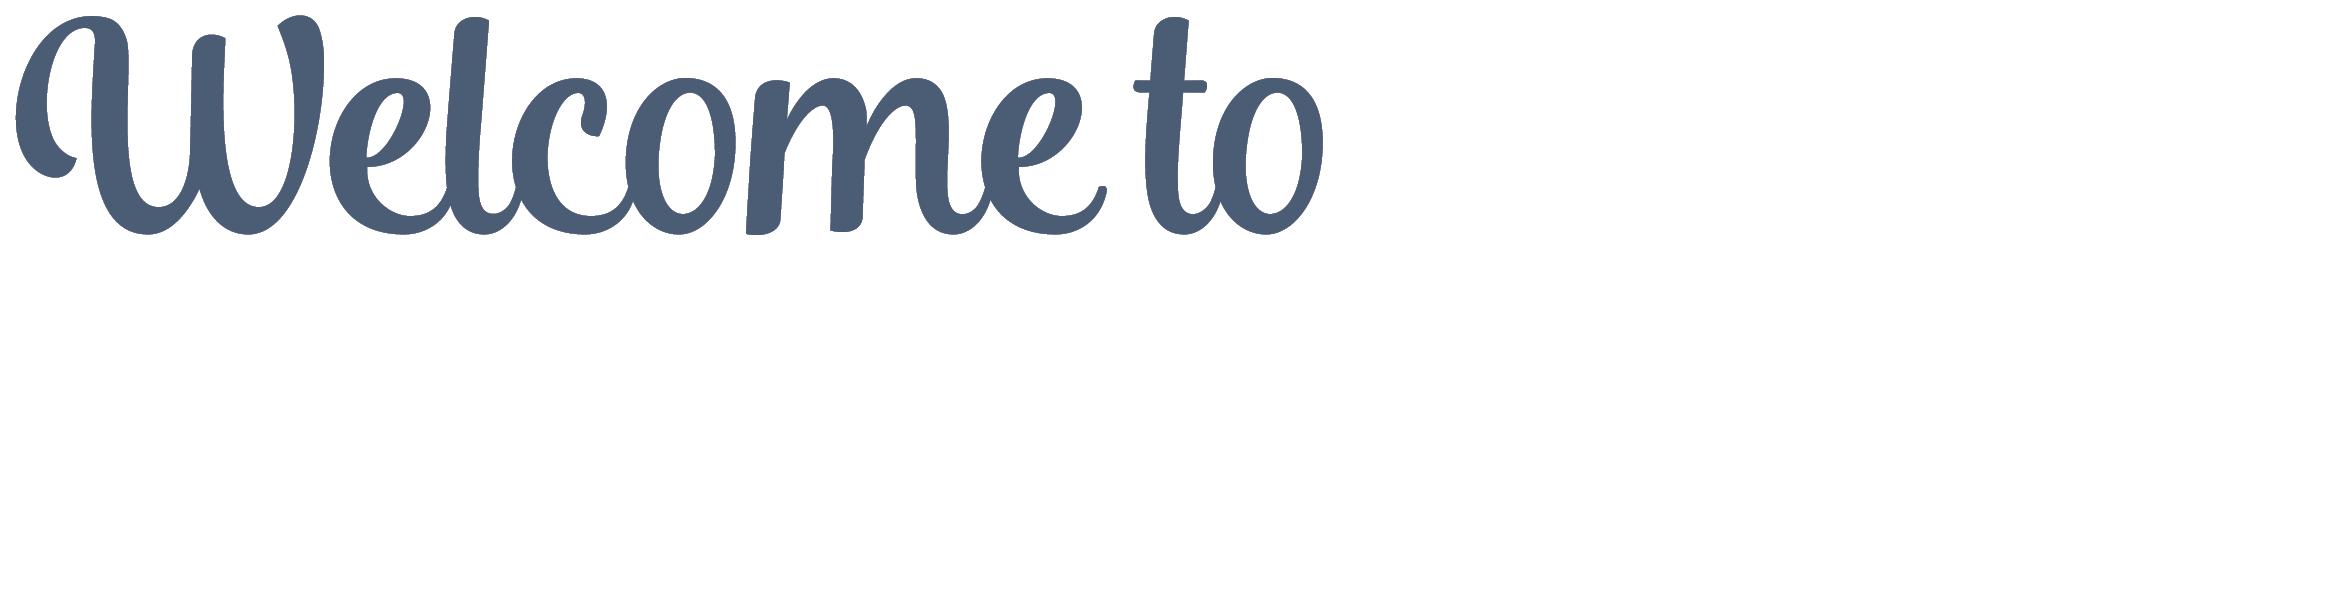 amanda abella millennial business coach